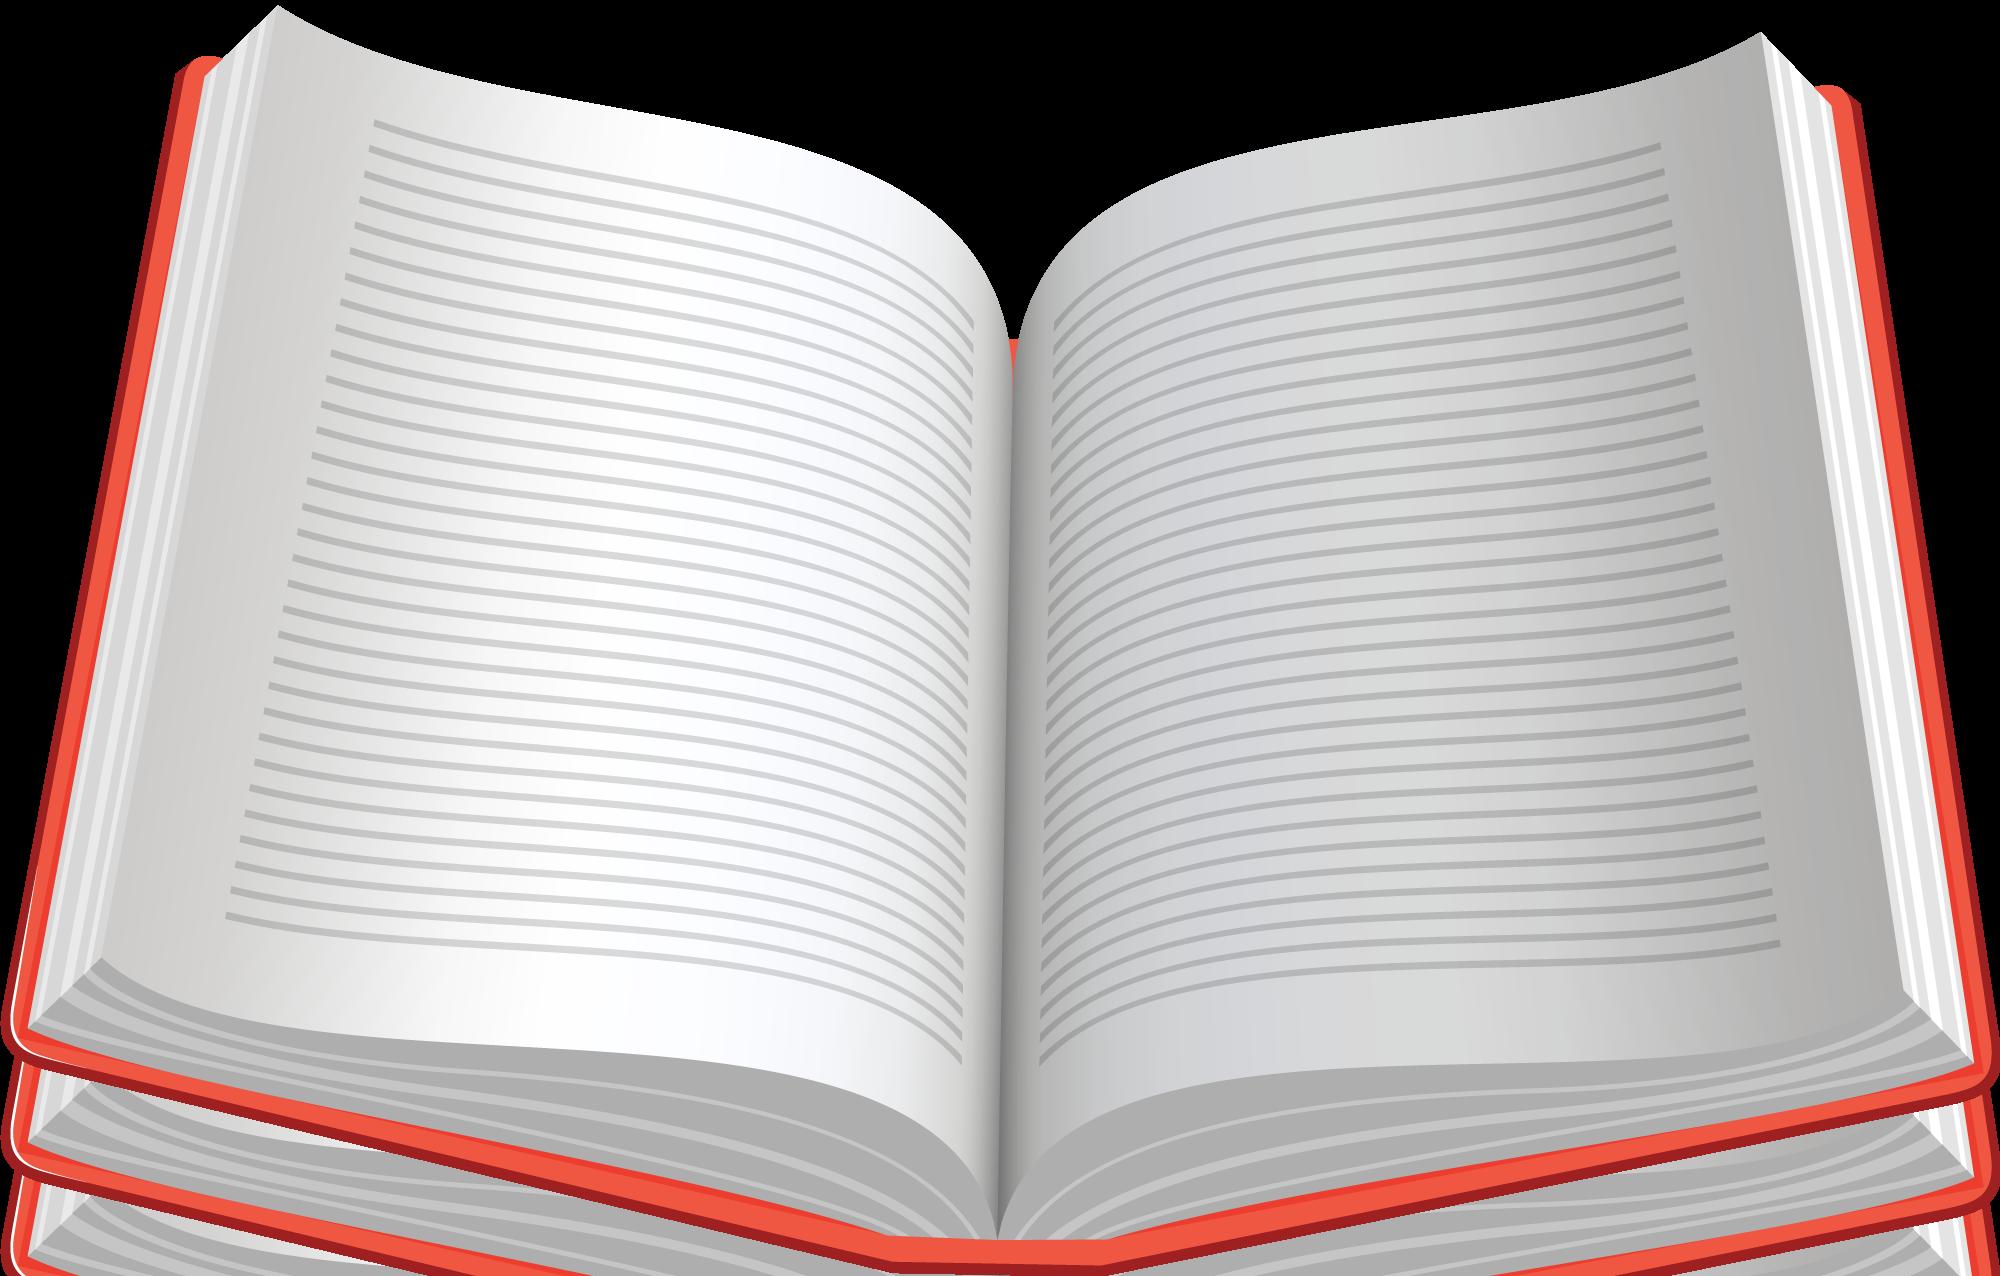 Open book clip art light. Images ideal vistalist co